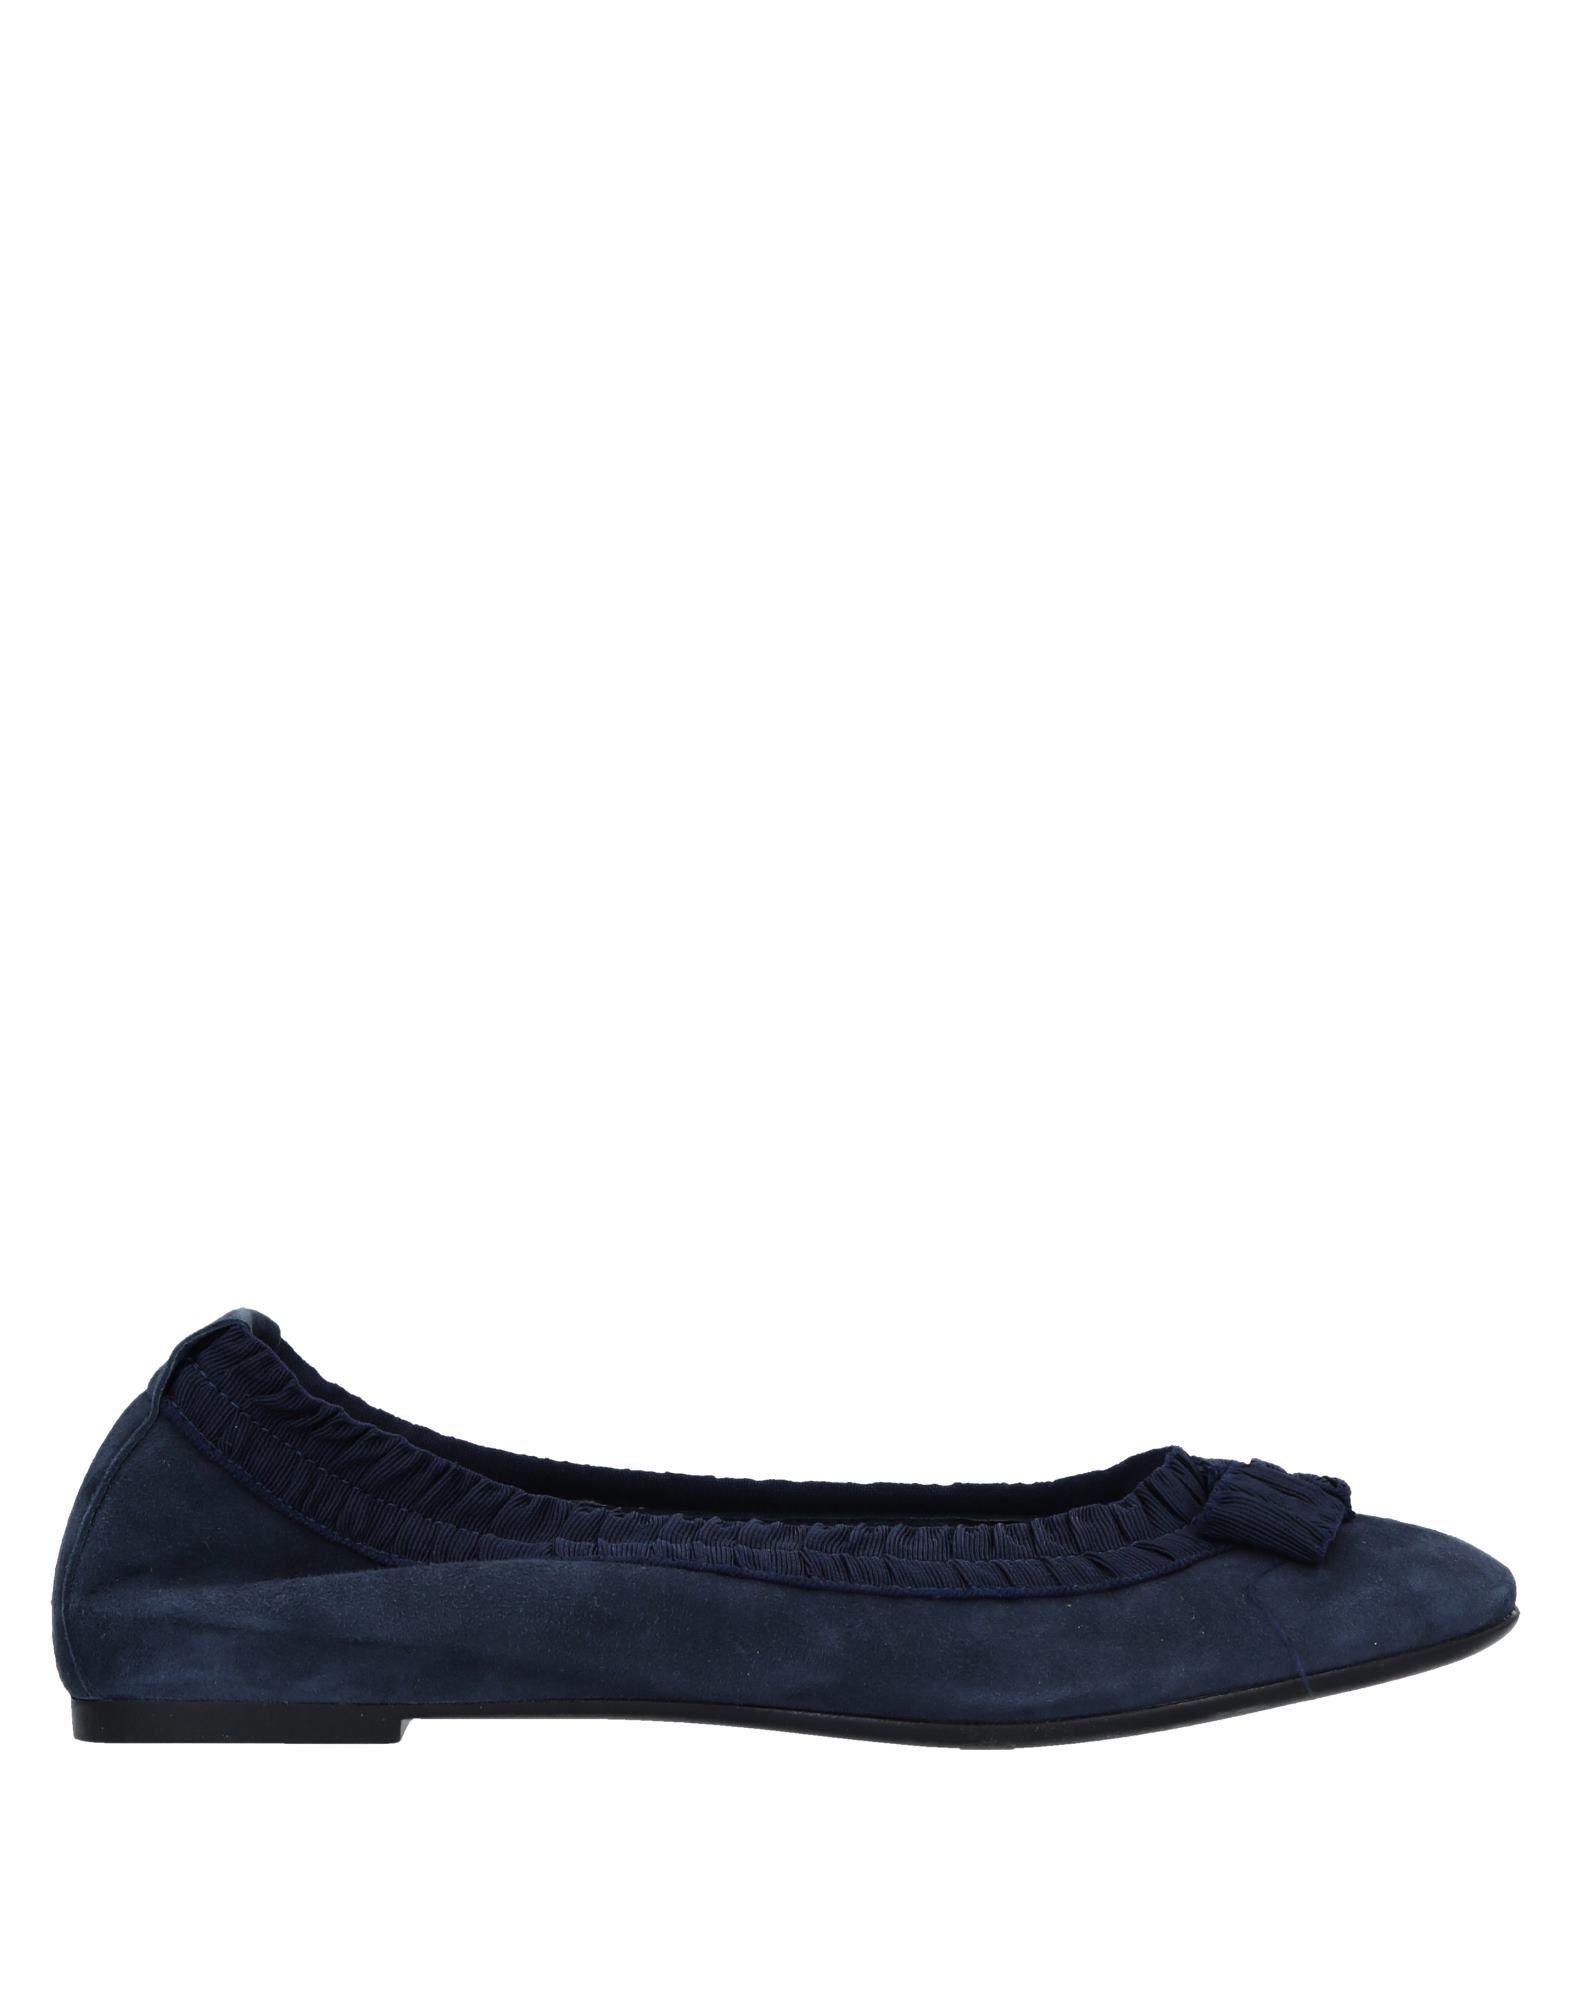 Frau Ballerinas Damen  11533932MQ Gute Qualität beliebte Schuhe